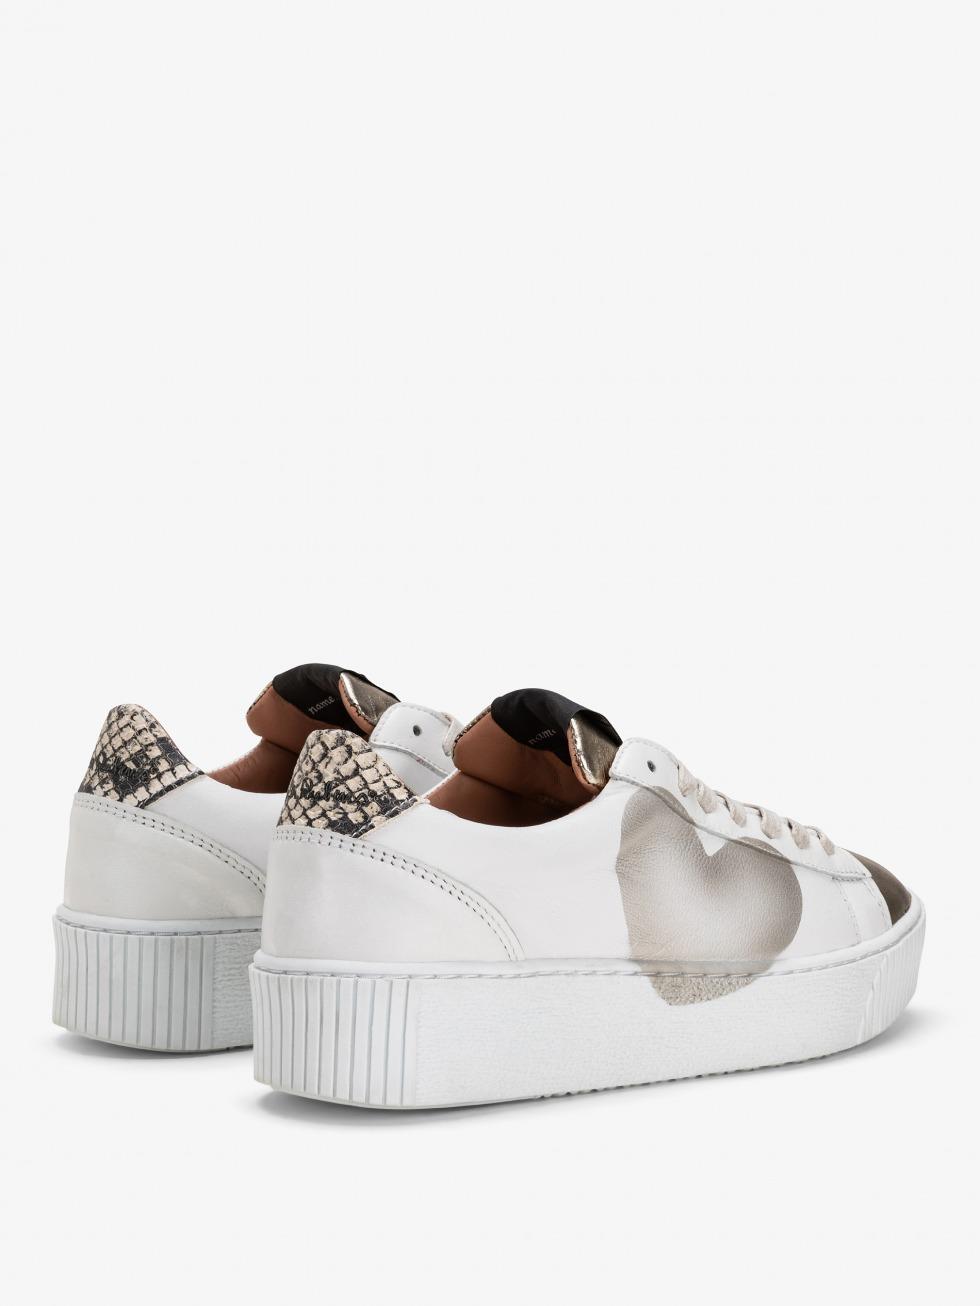 Cosmopolitan Python Sneakers - Platinum Heart